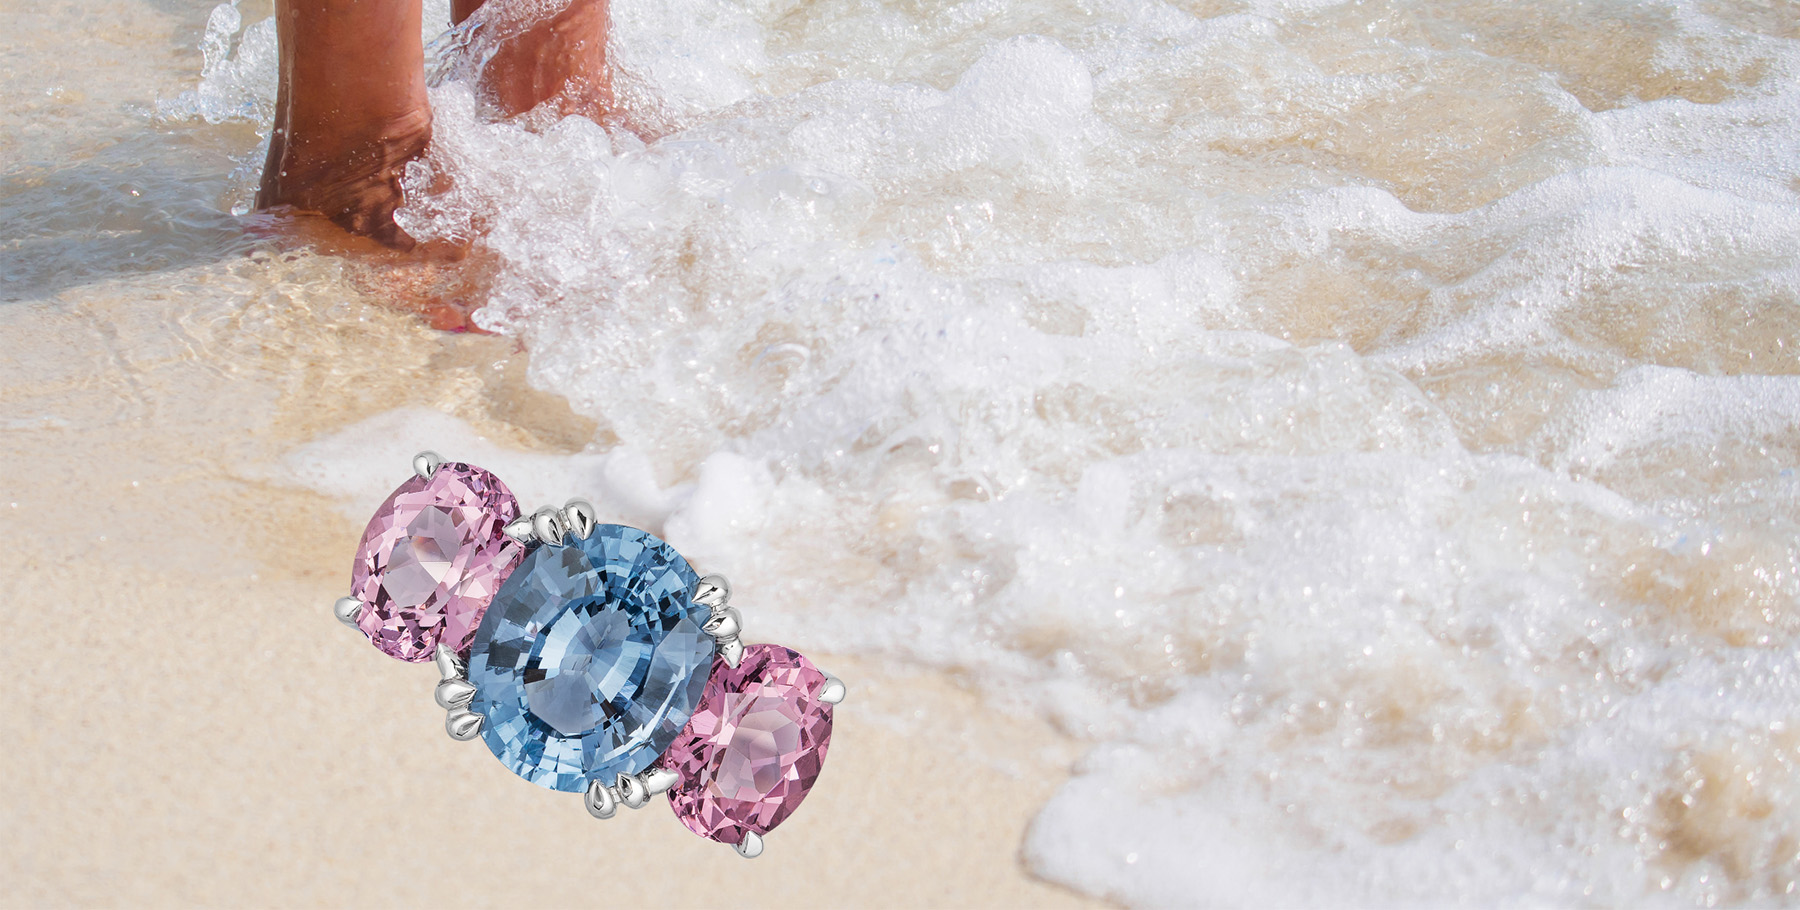 """Summer Jewelry Care Tips"" by jewelry designer Cynthia Renée."